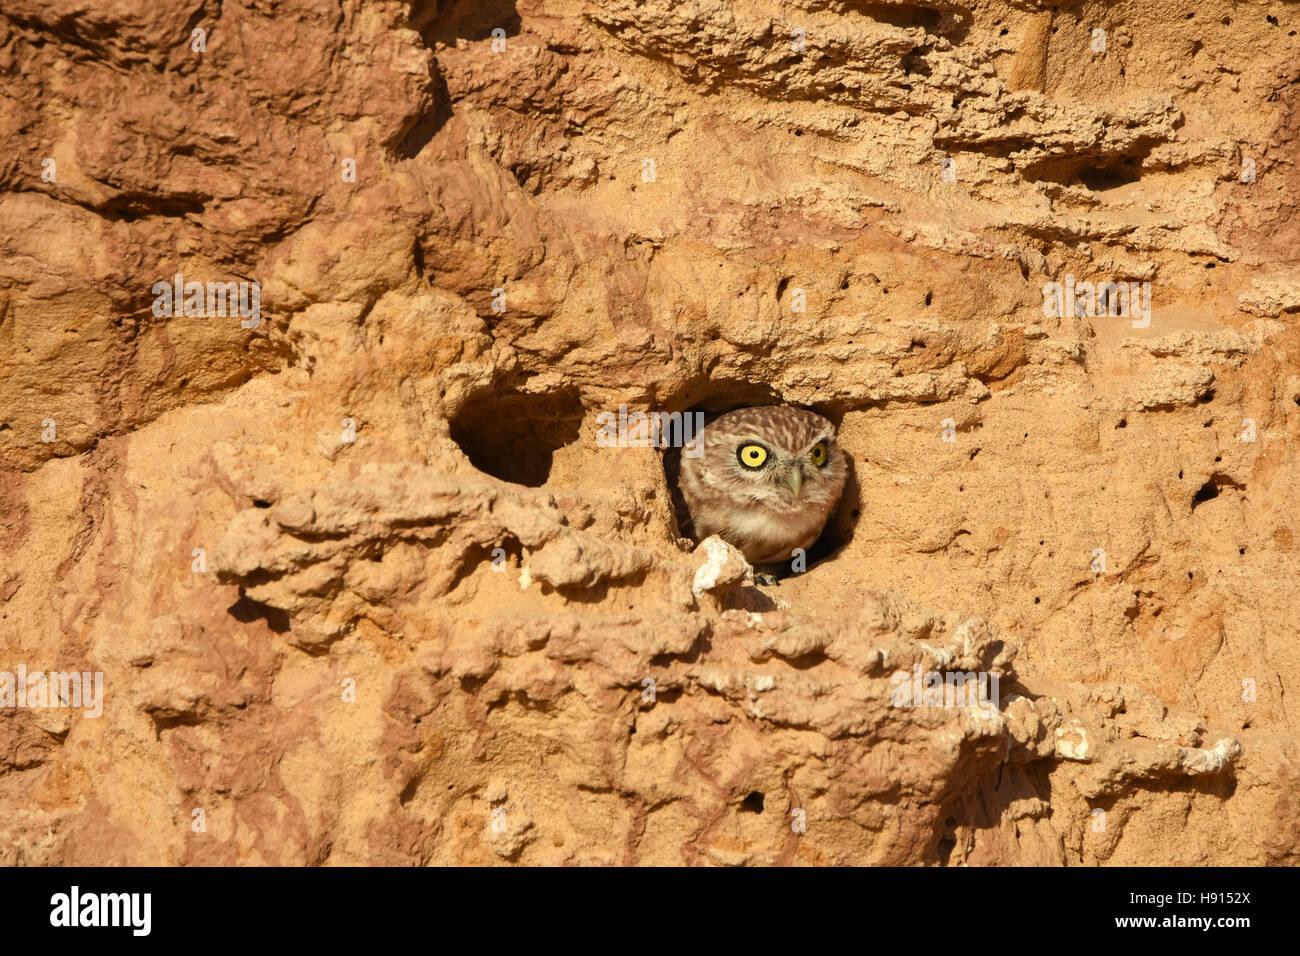 Little Owl, Athene noctua, peeking out of its burrow Stock Photo